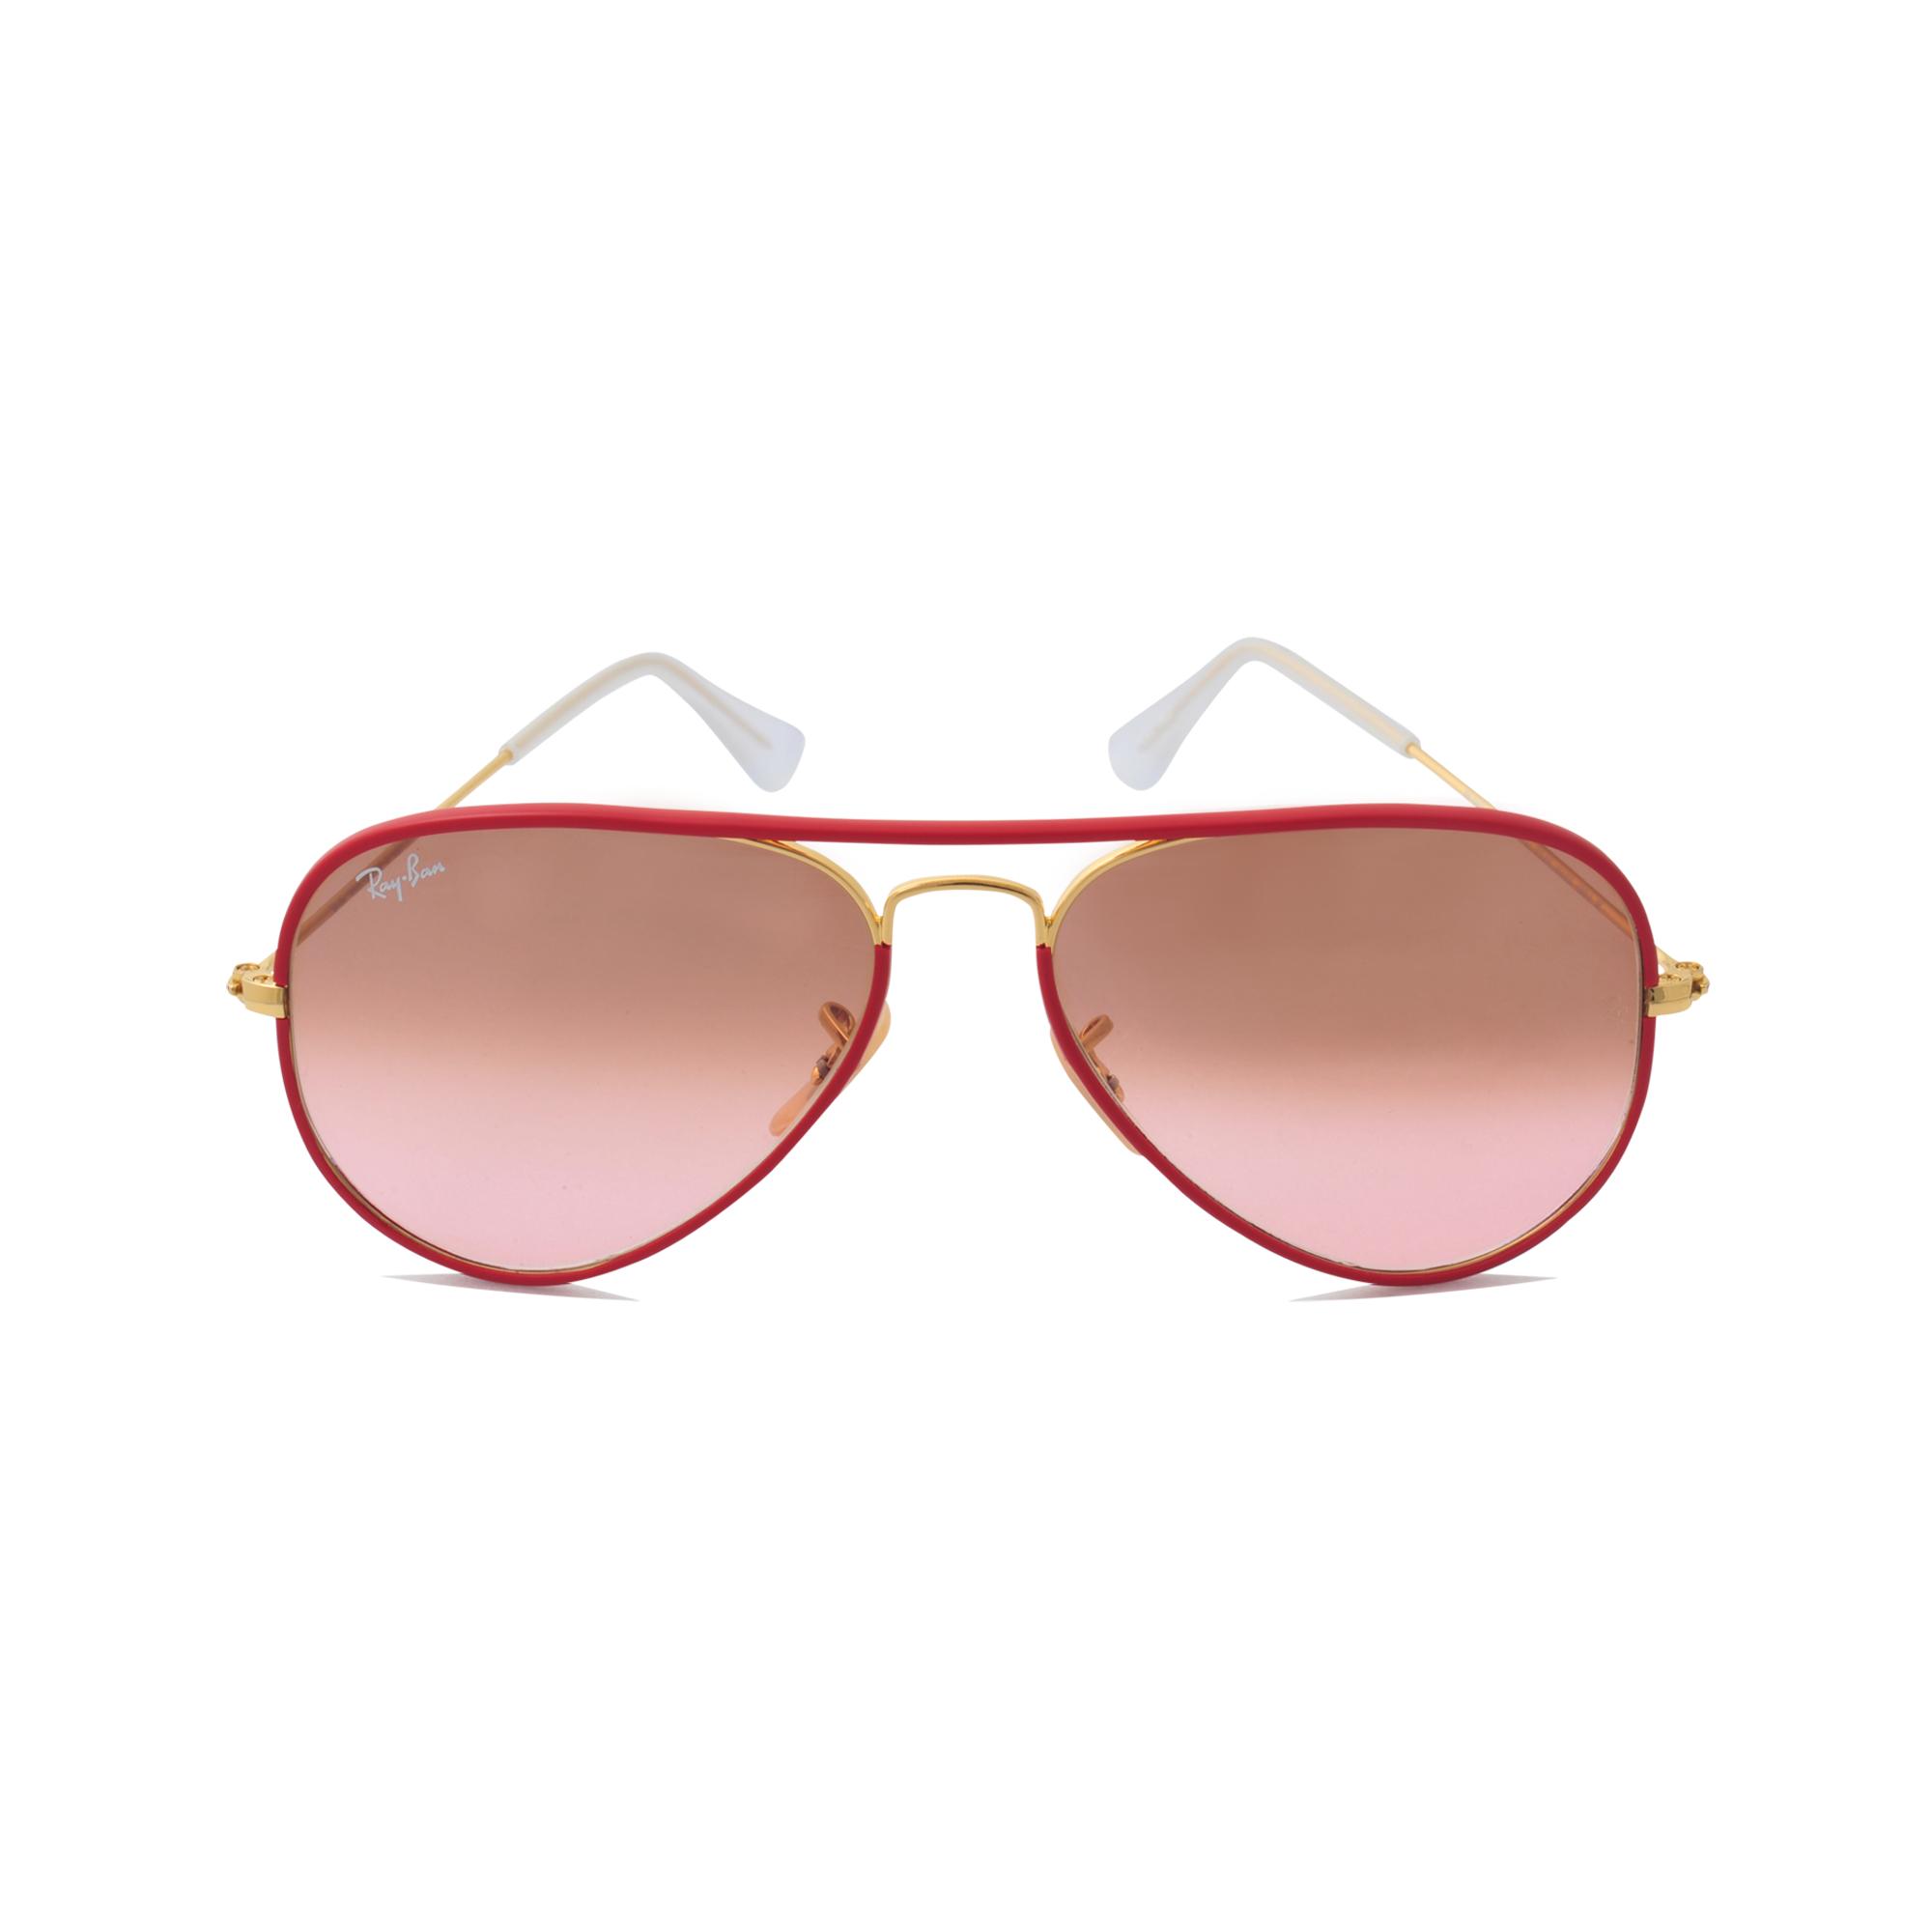 bfefb5ef0f Ray Ban Style Glasses Ebay